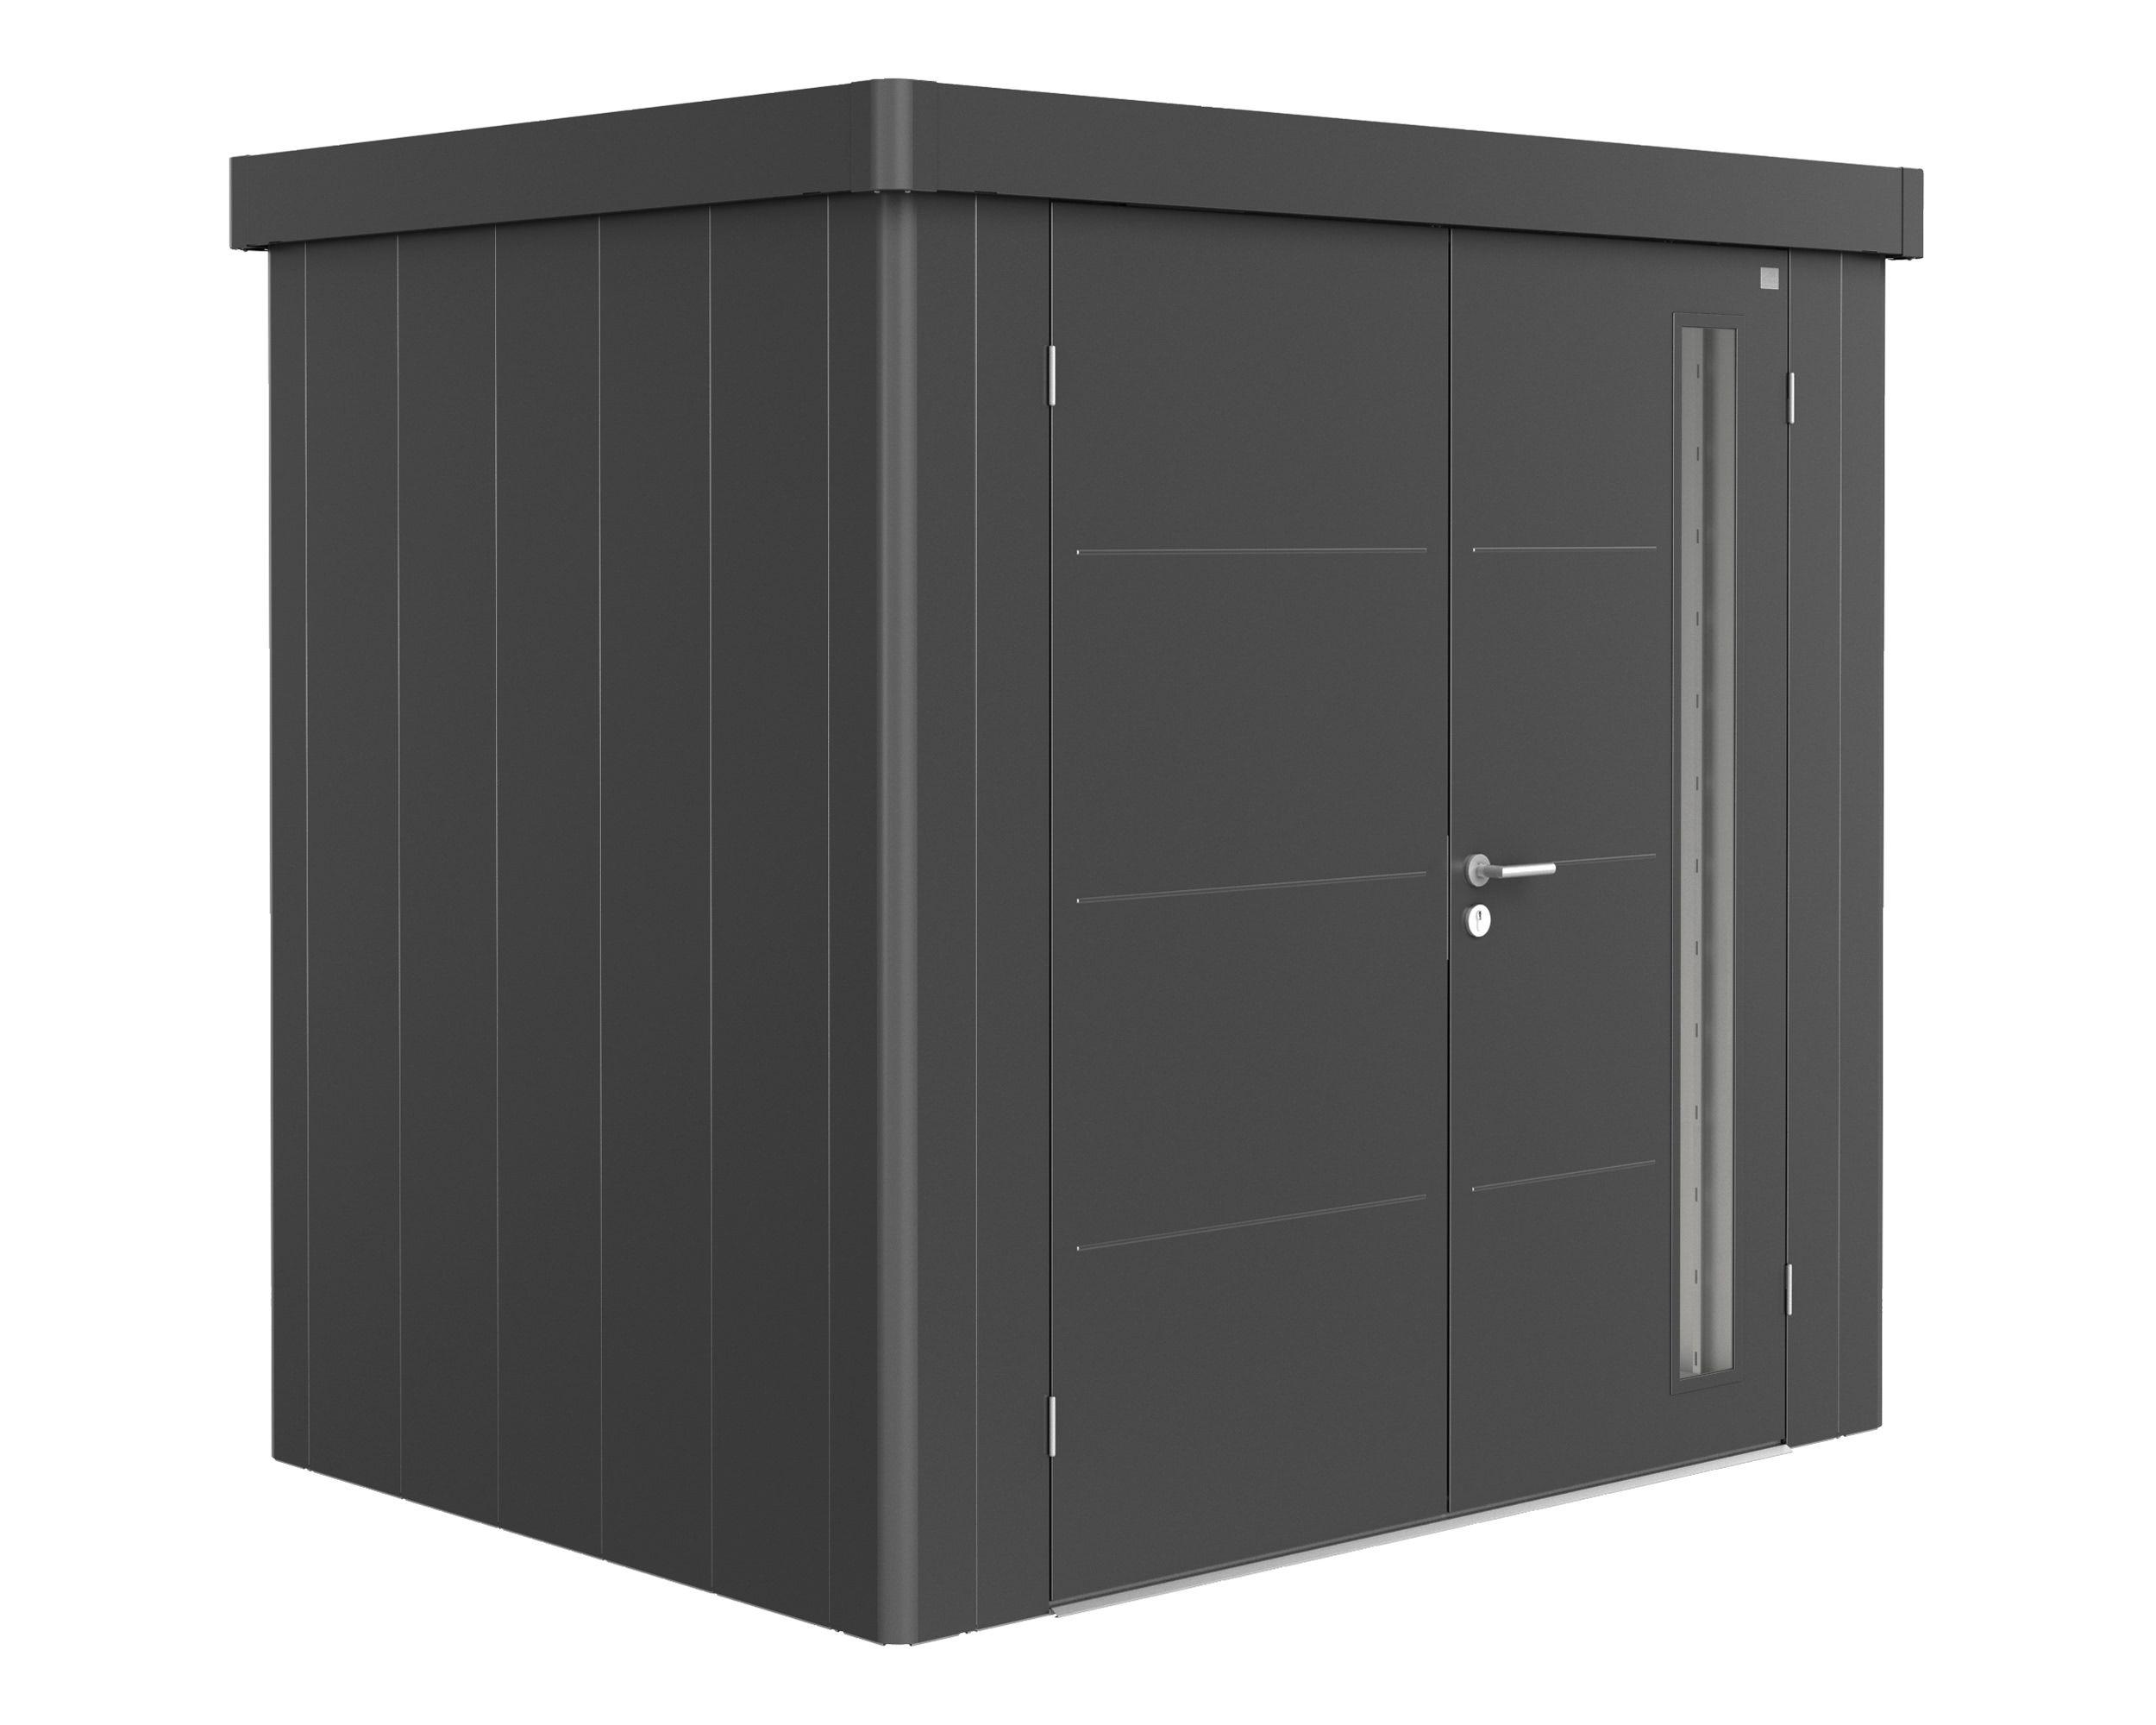 Gerätehaus Neo, 1B, 236x180 cm, Doppeltüre